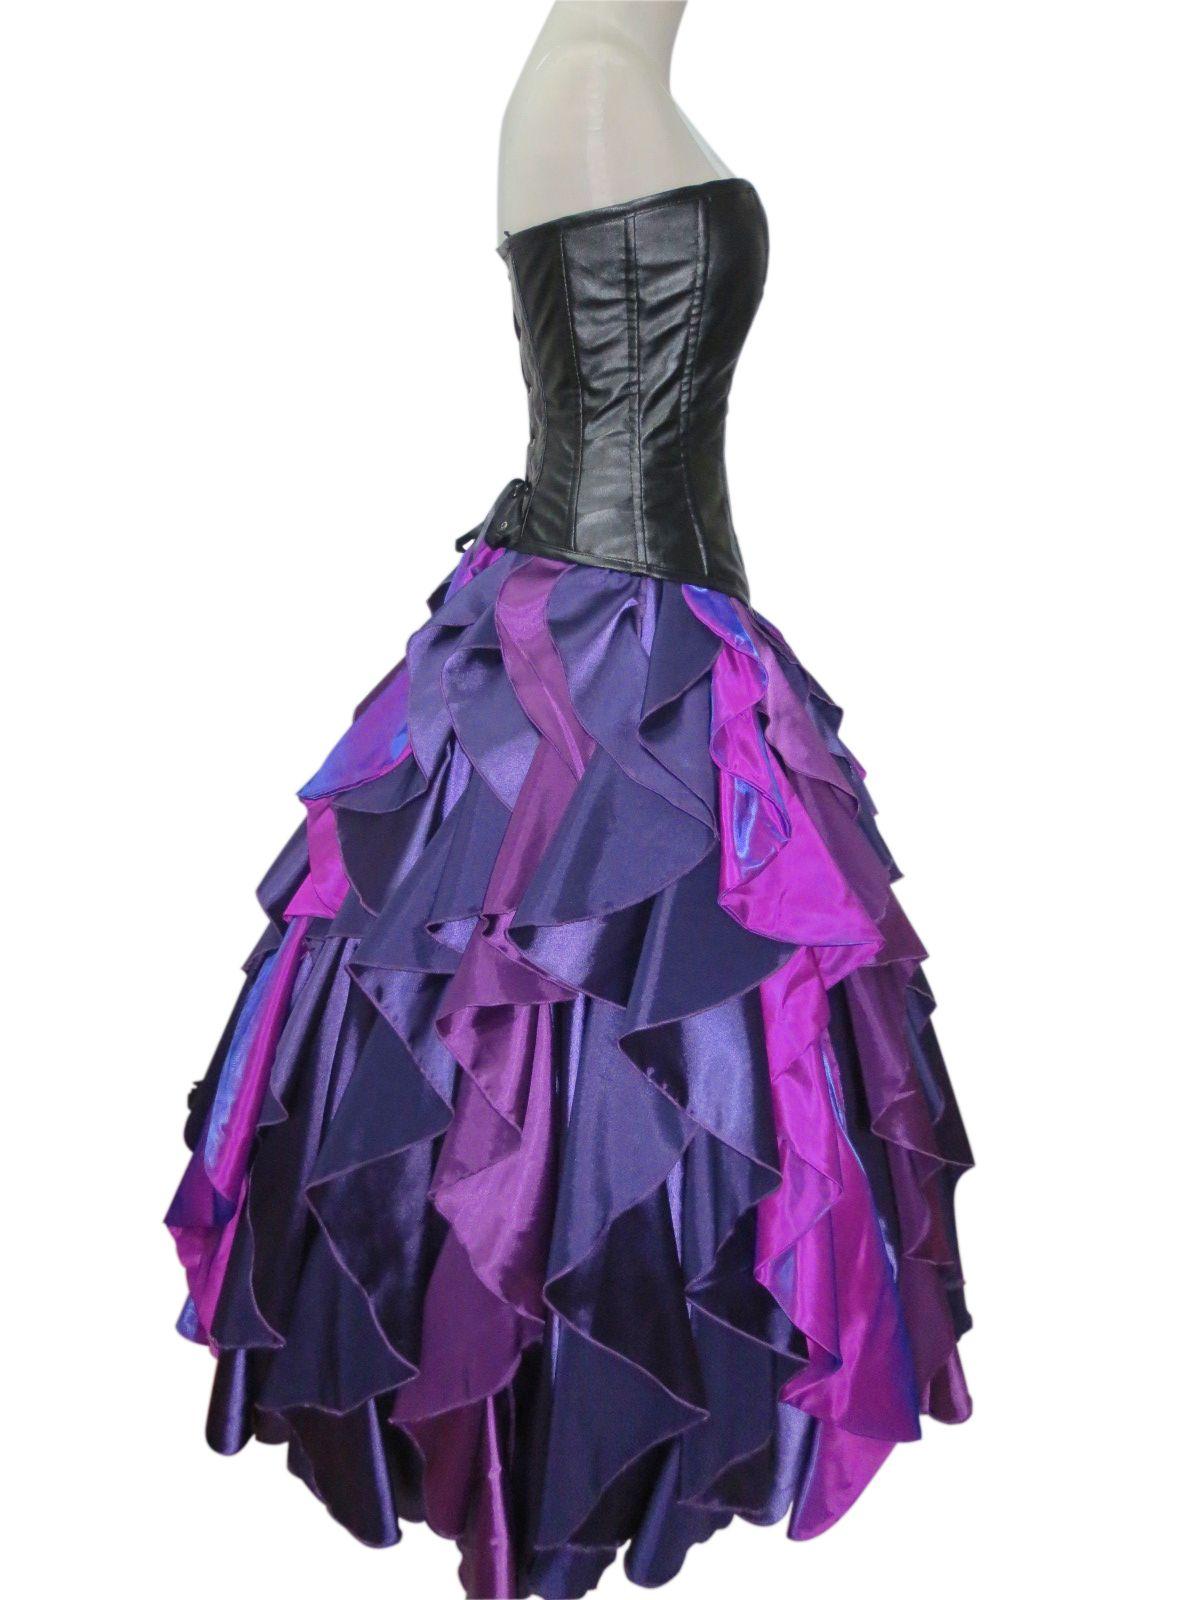 Date La Petite Robe De Sirène Sorcière De Mer Ursula Robe De Princesse Costume Cosplay